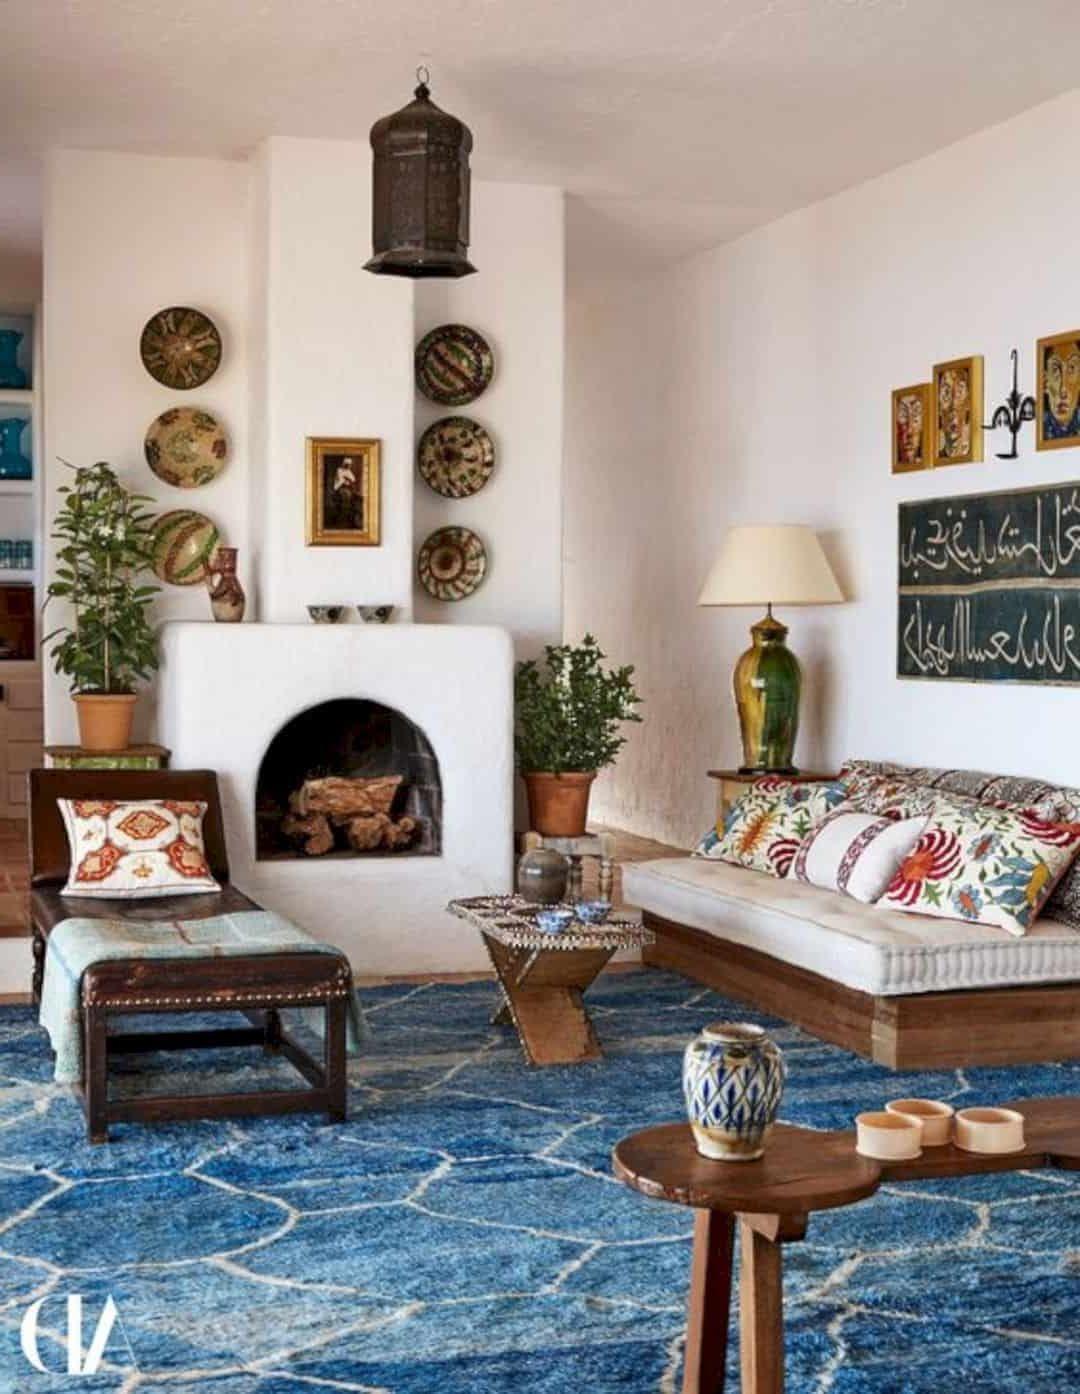 Living Room Moroccan Living Room Design Moroccanlivingroomdesign Moroccan Living Room Boho Scandinavian Living Room Living Room Scandinavian Moroccan inspired living room